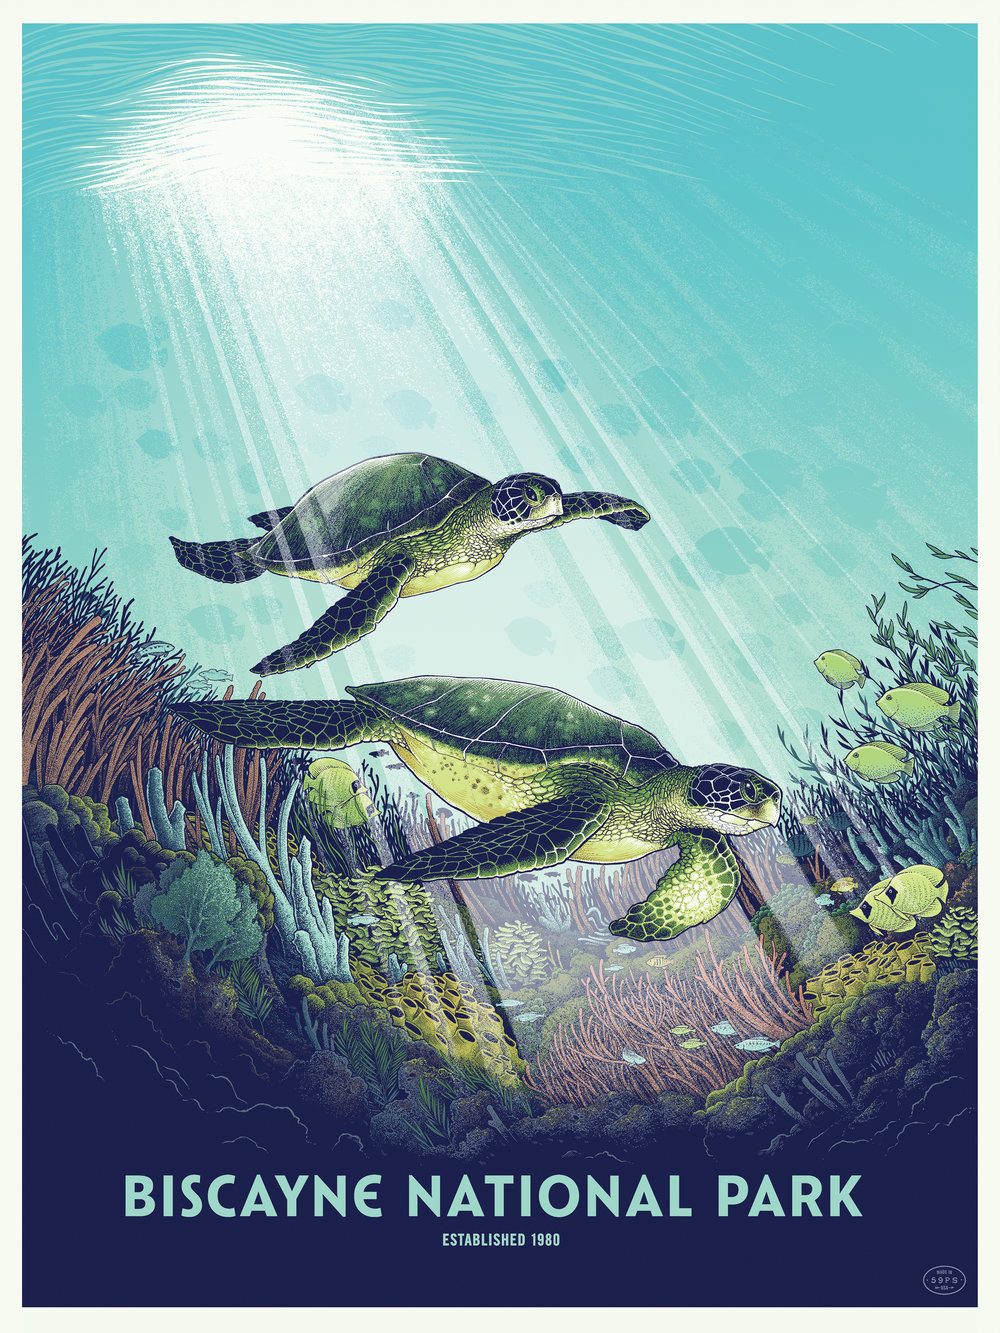 Biscayne-National-Park-Justin-Santora-Fifty-Nine-Parks-Print-Series_rgb.jpg